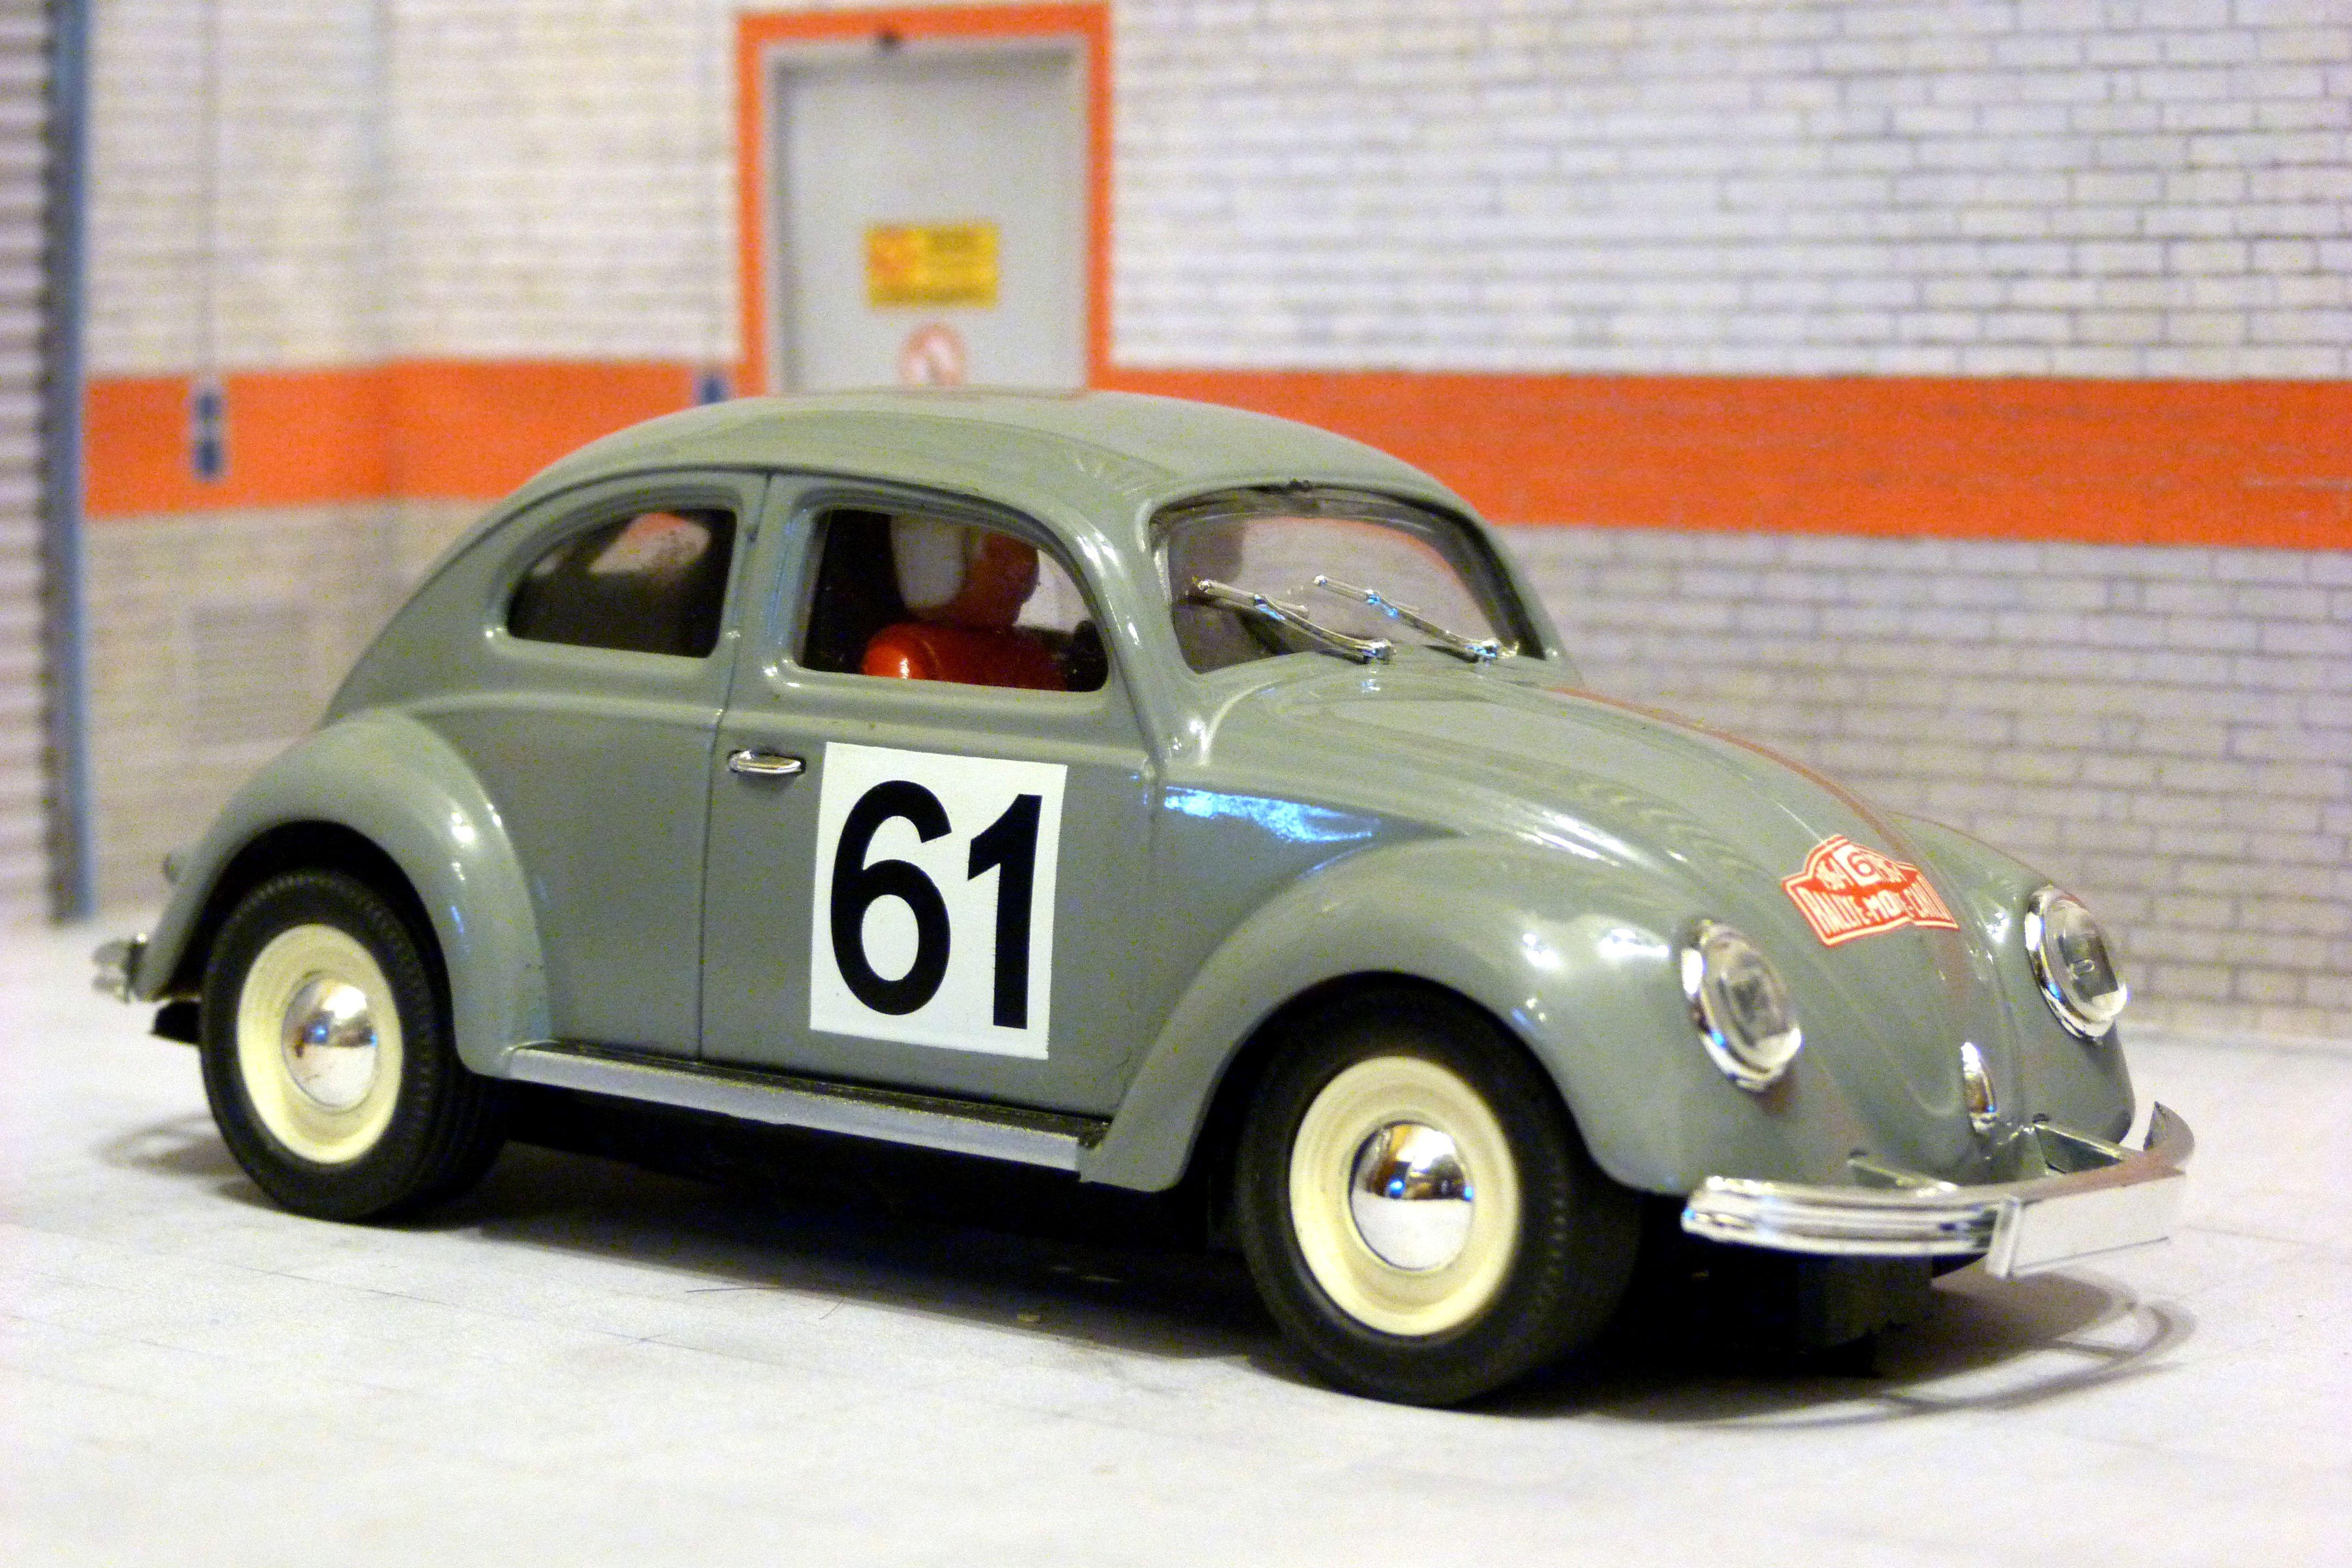 VW Beetle Rally Montecarlo 1964  Pink Kar  1:32 Slot Car